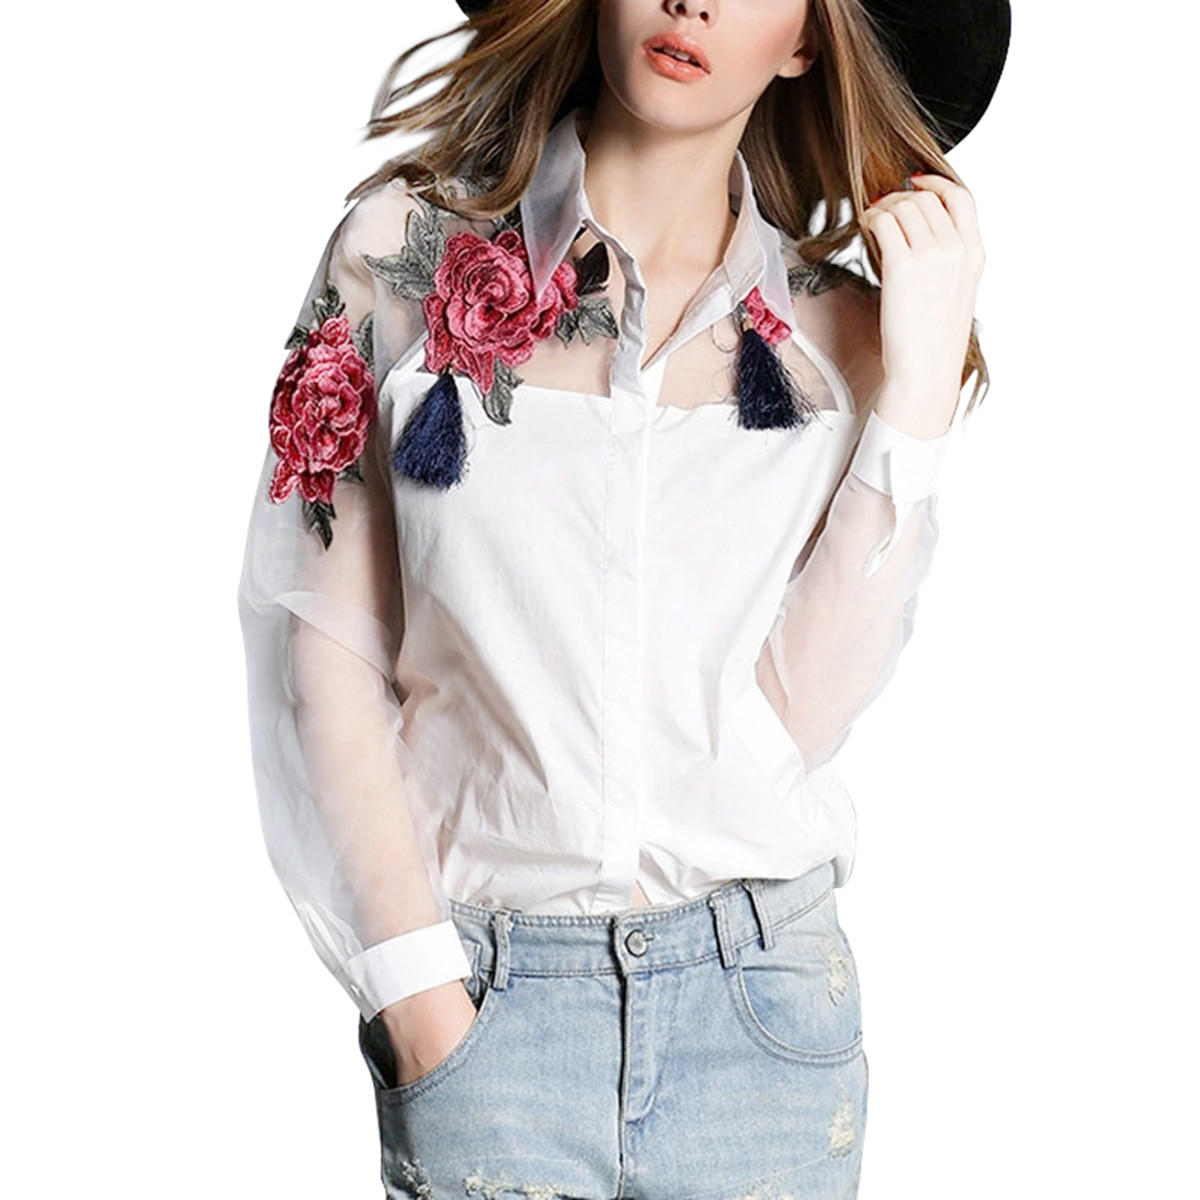 HTB1CUfaNVXXXXXgXpXXq6xXFXXX6 - Autumn Sexy Women Blouses Off Shoulder Lace Crochet Shirts